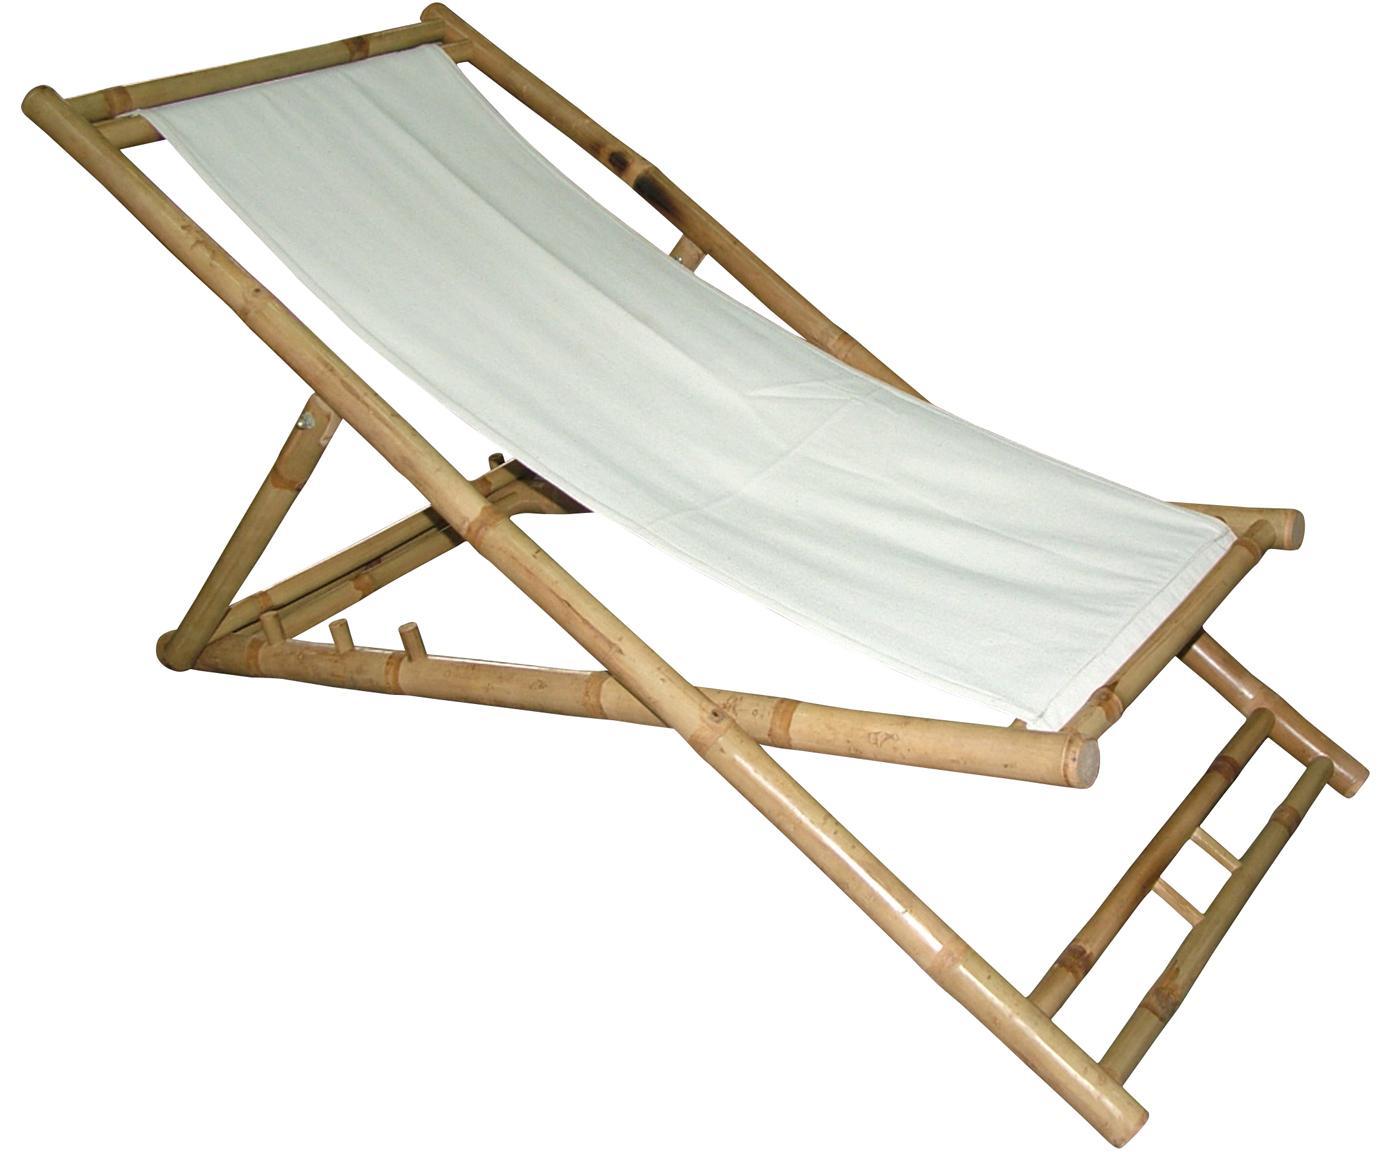 Inklapbare  bamboe ligstoel Bammina, Bamboe, textiel, Wit, 60 x 80 cm